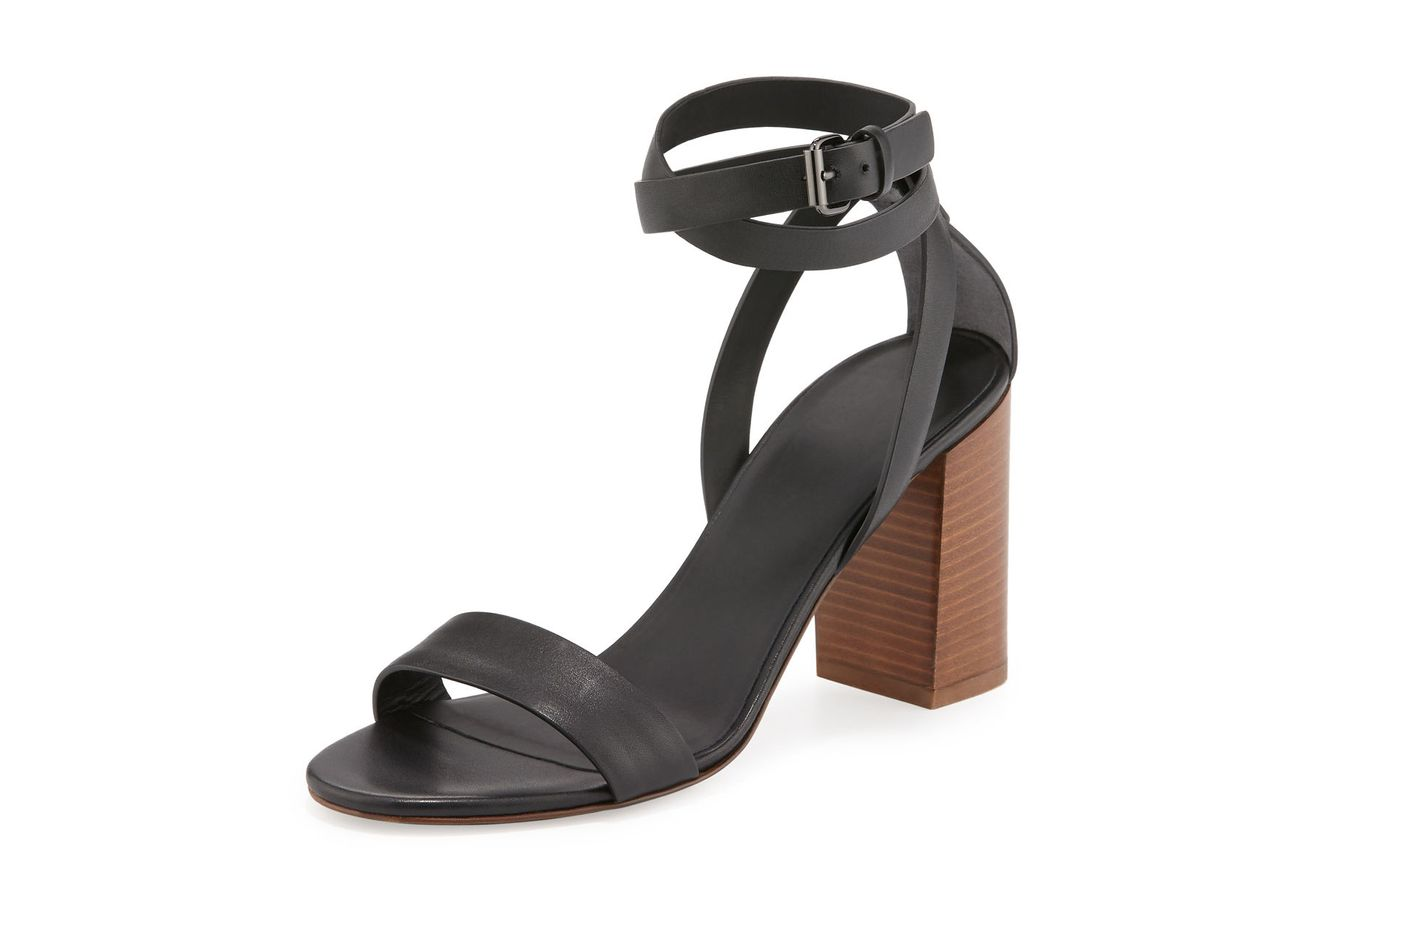 Vince Farley Ankle-Wrap Block-Heel Sandal